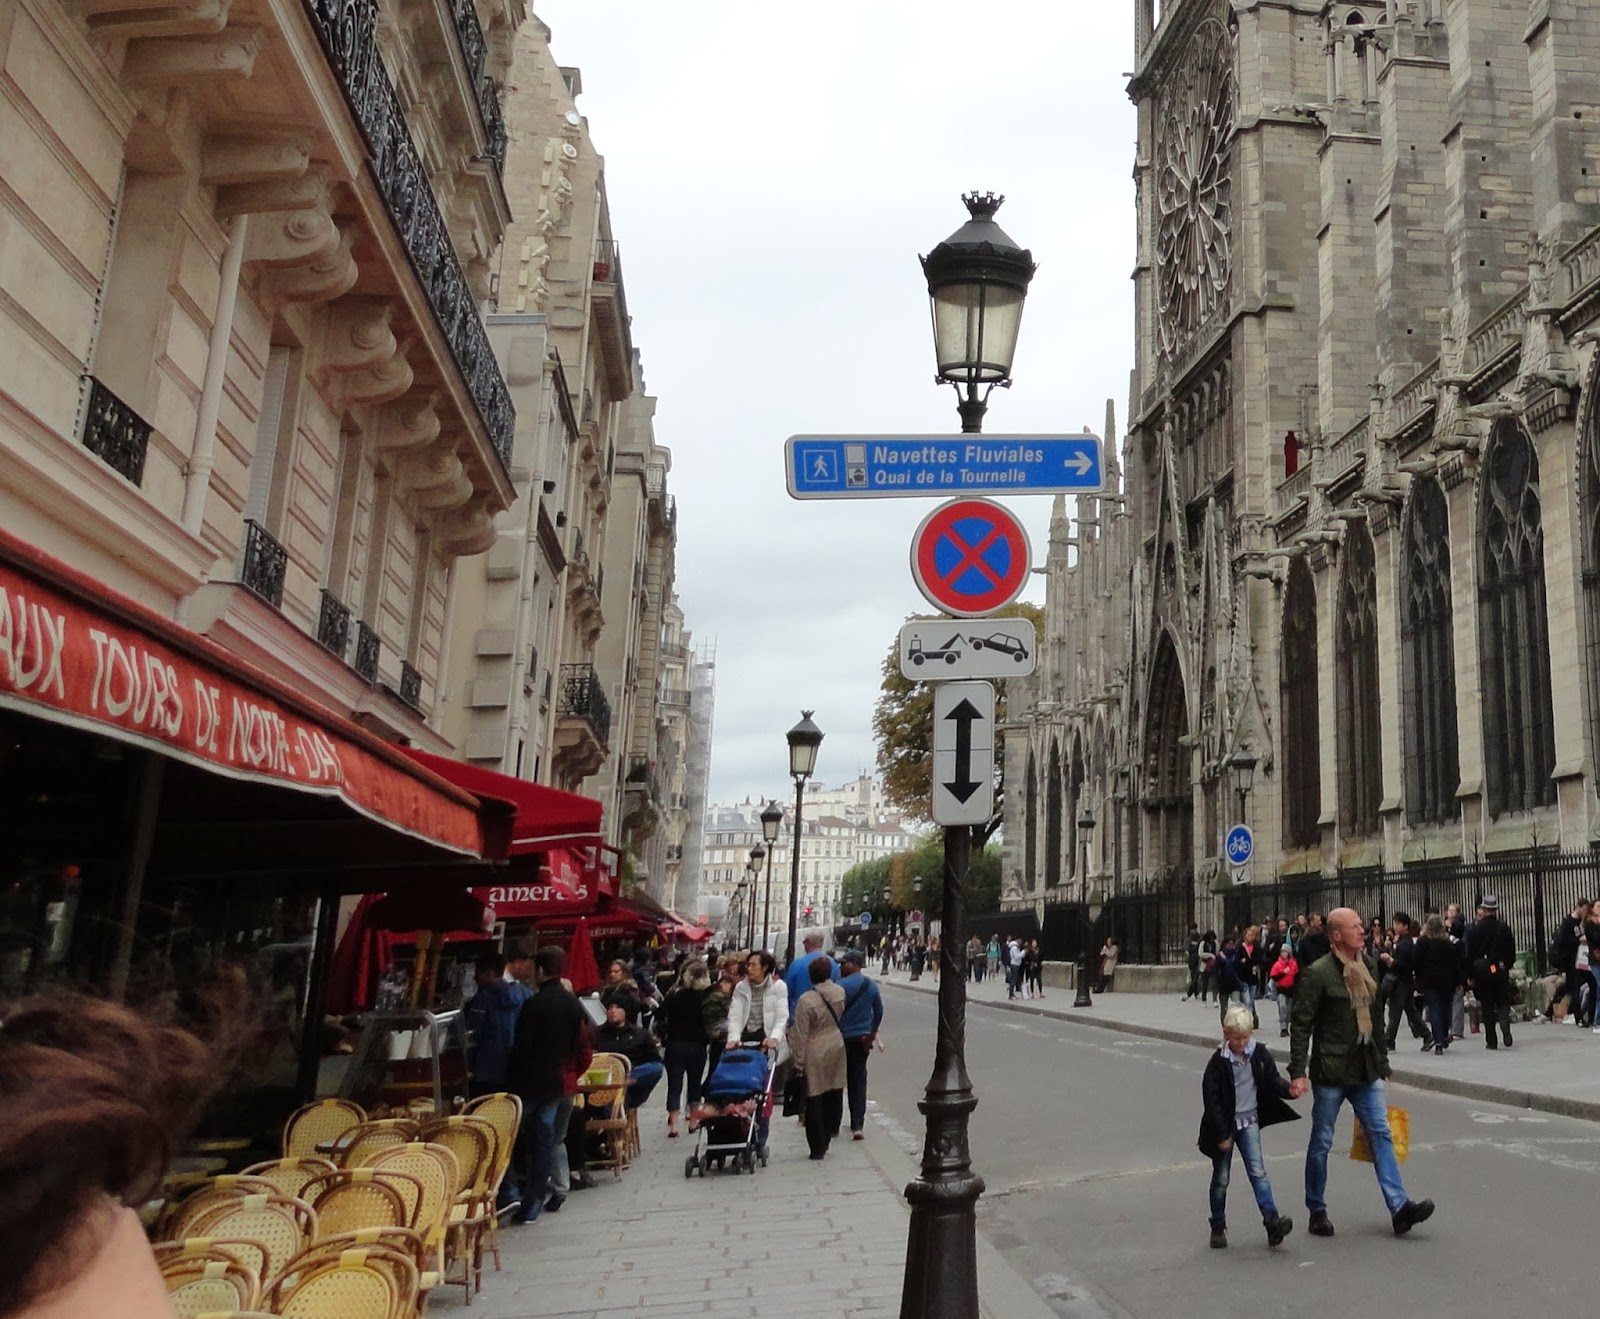 Cido pisani a comida francesa for Comida francesa famosa